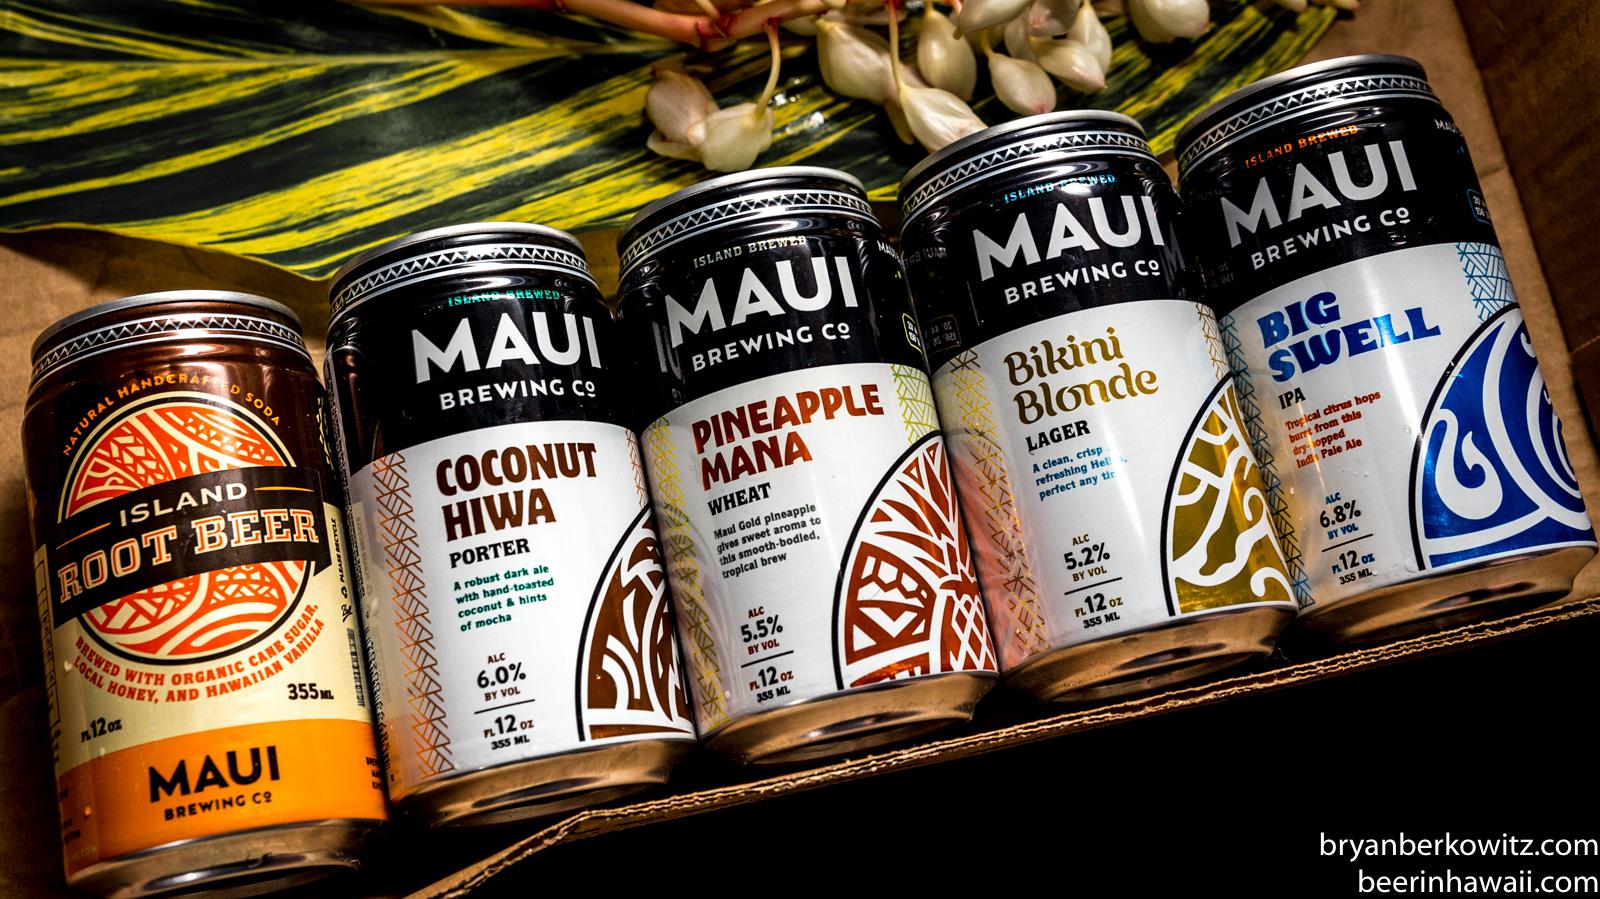 Maui Brewing Company Hawaii Metal Tin Beer Bar Sign BIG SWELL IPA New Design!